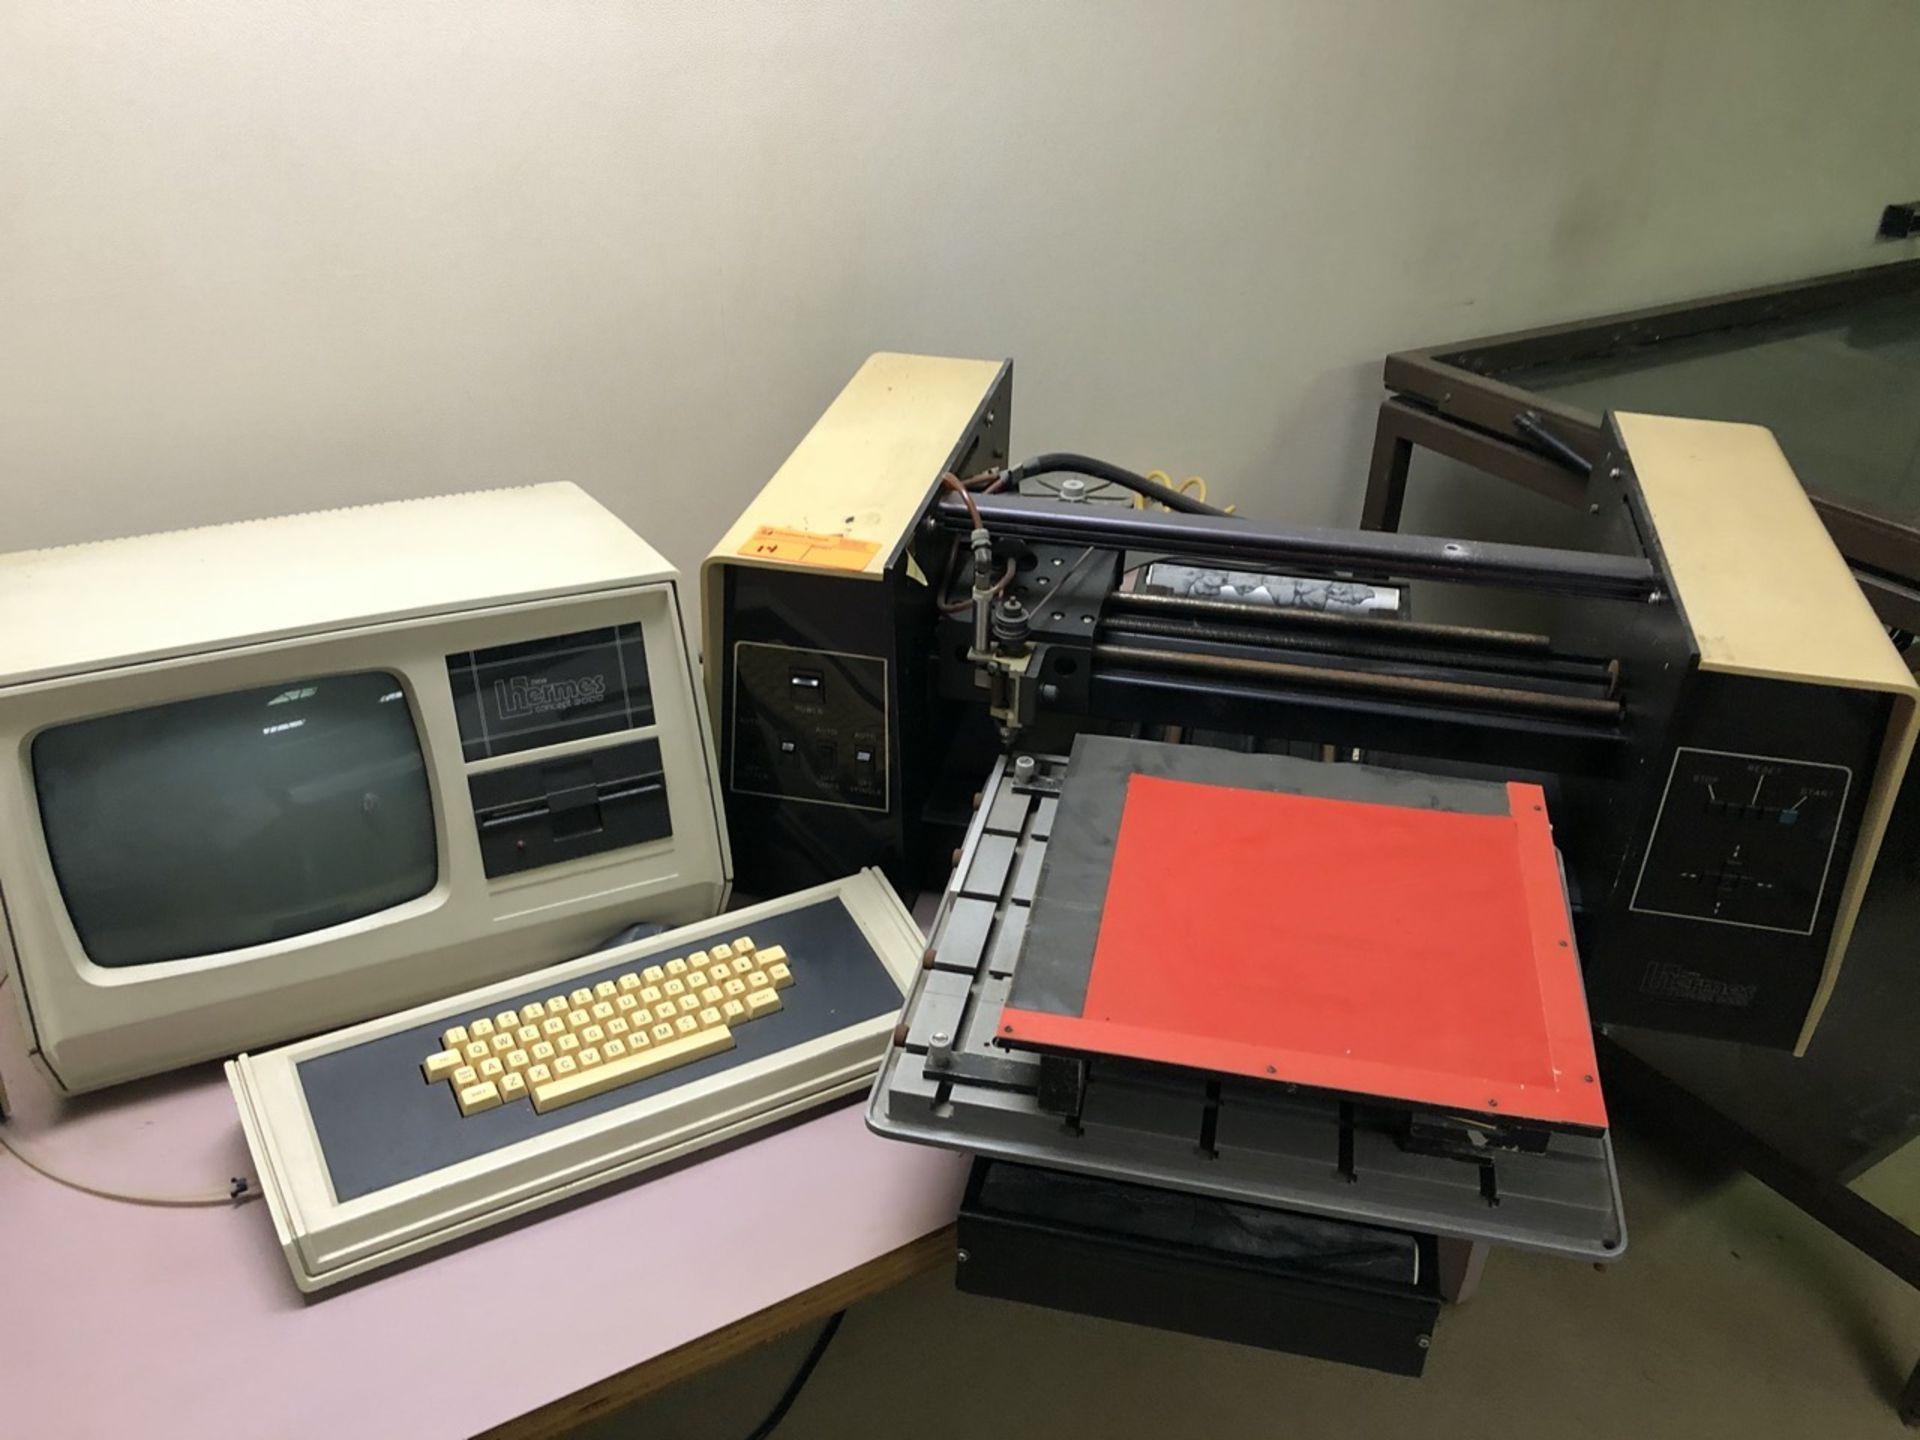 Lot 14 - Hermes Concept 2000 Engraving Machine